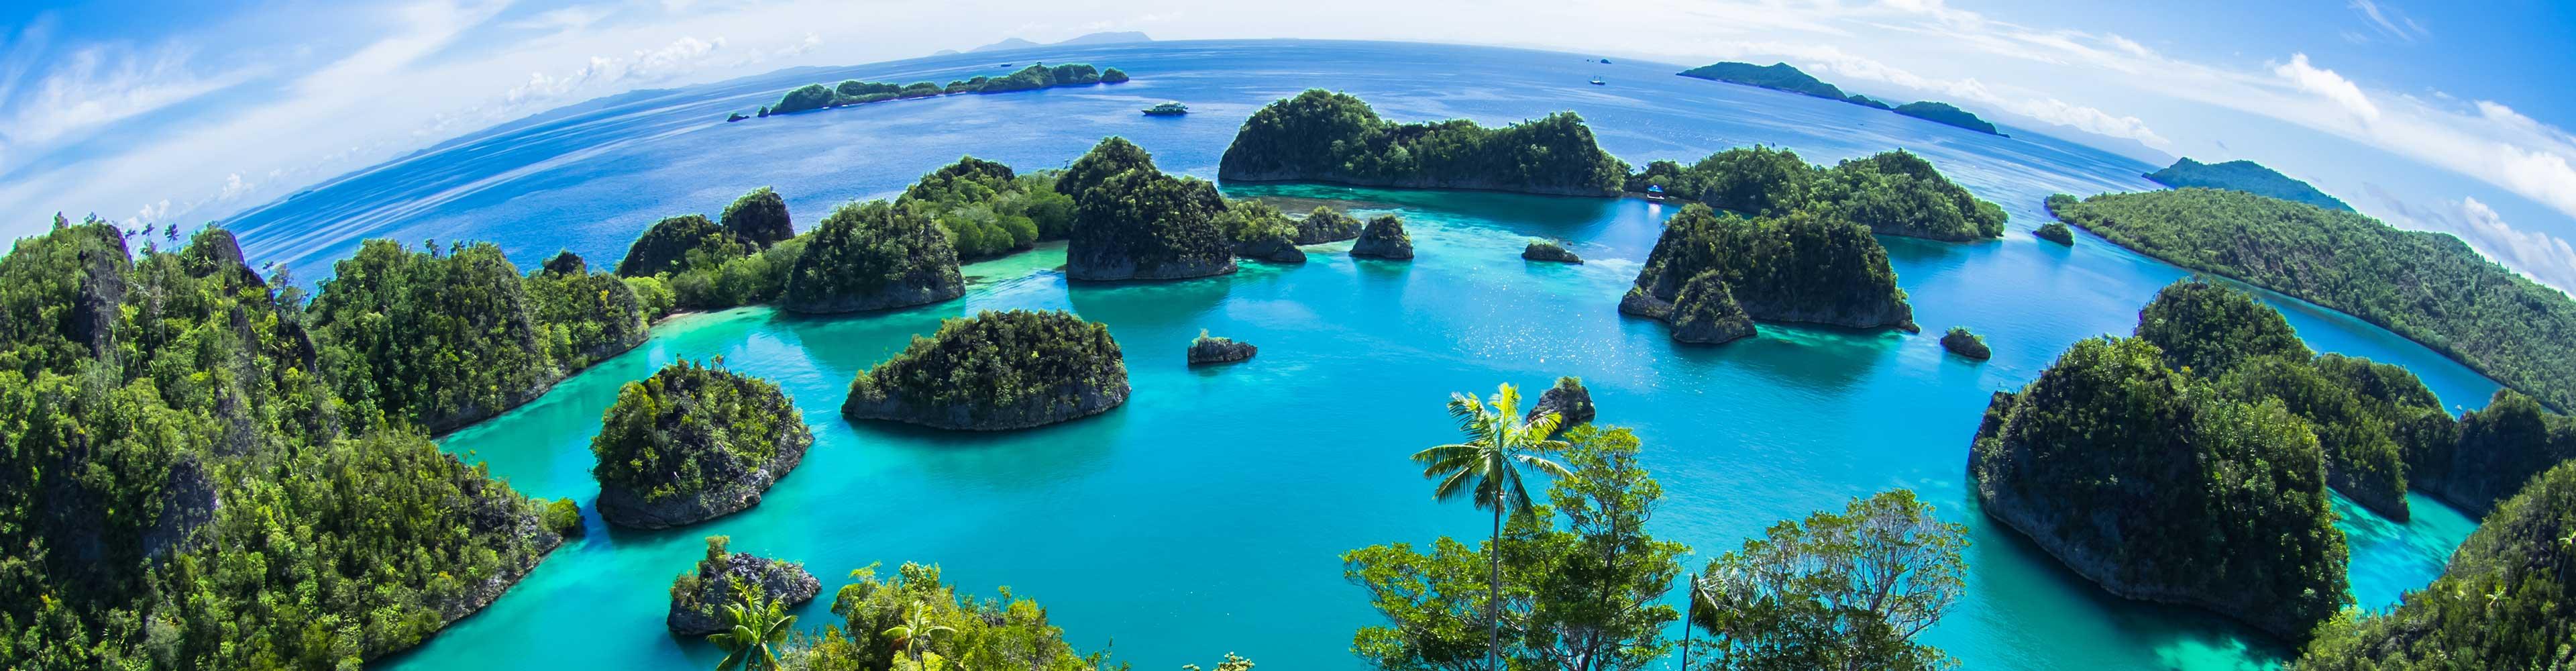 Raja Ampat Sailing Expedition